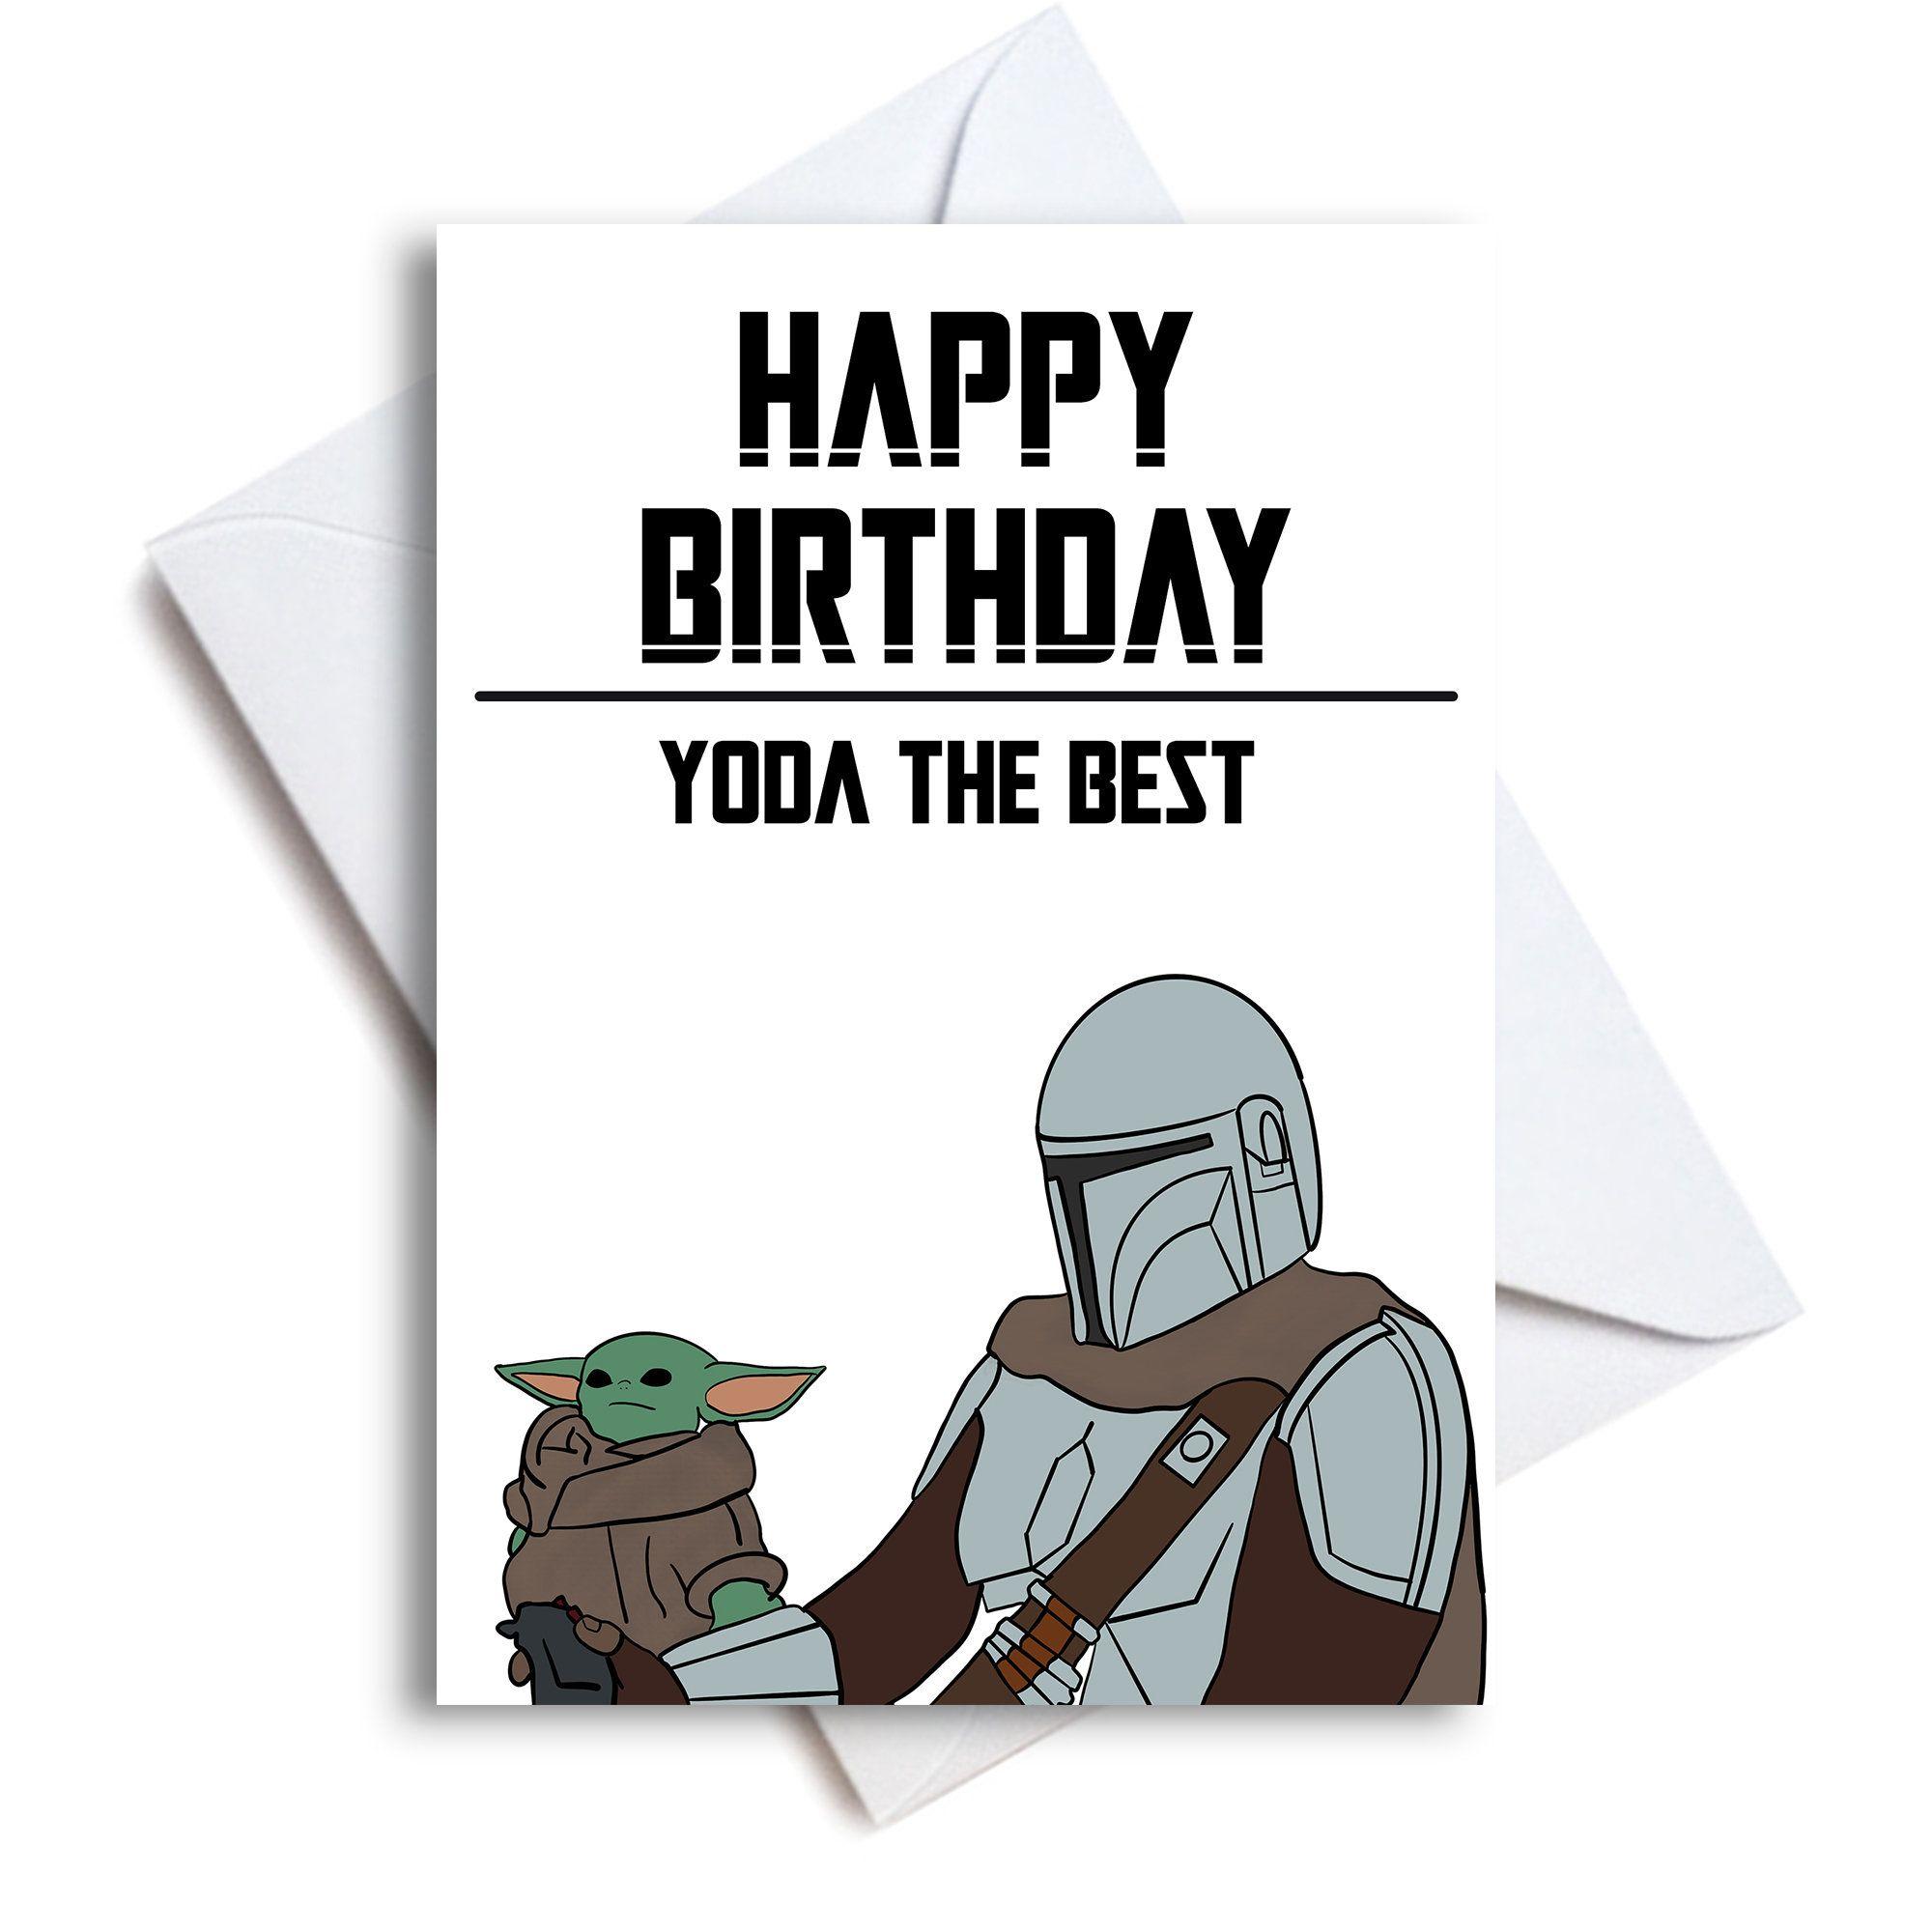 Baby Yoda Happy Birthday Card Yoda The Best Baby Yoda Card Etsy In 2021 Yoda Card Yoda Happy Birthday Happy Birthday Cards